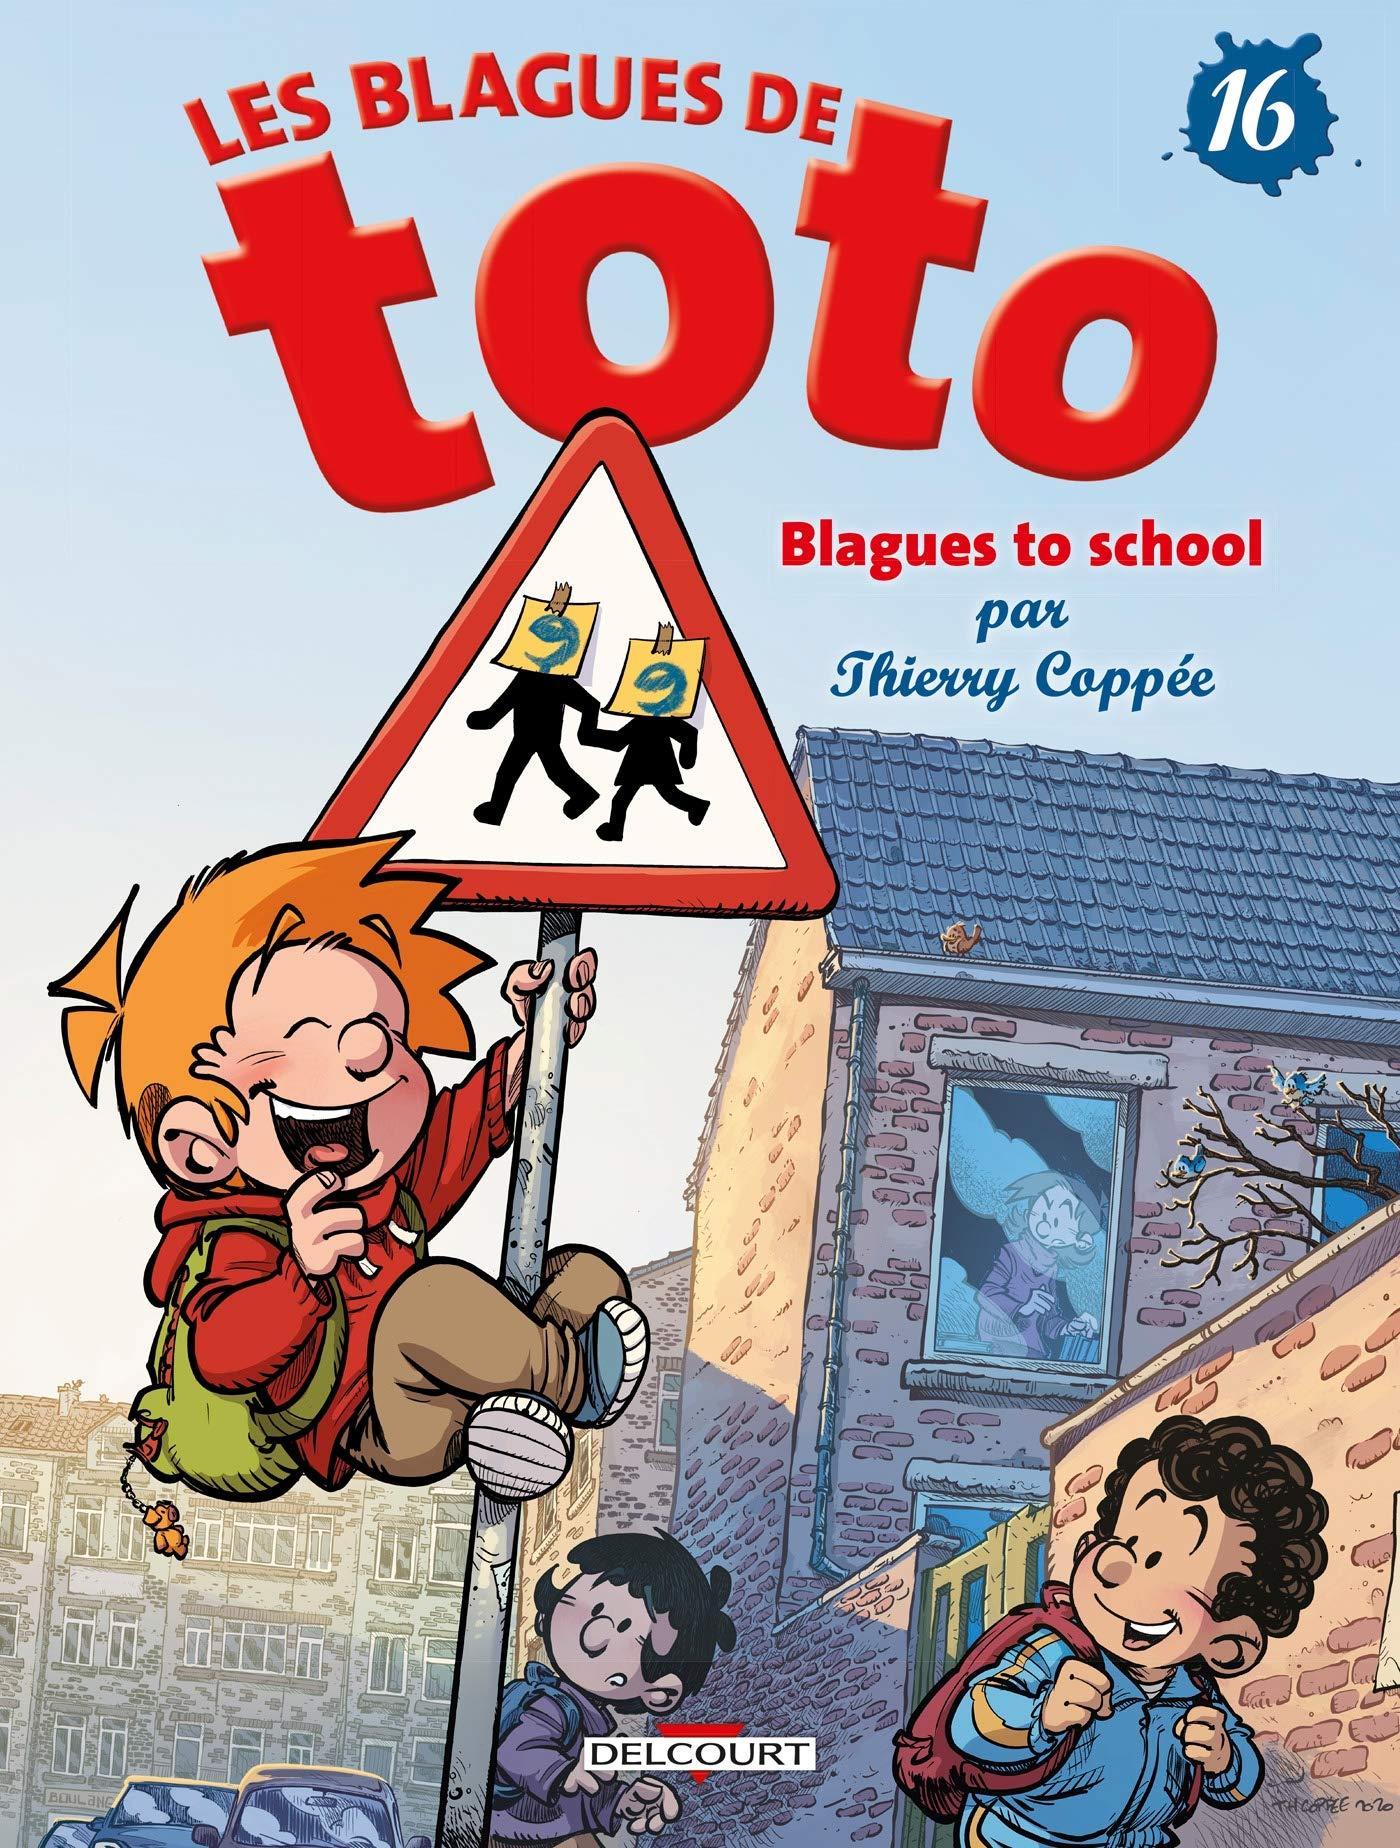 Les blagues de Toto 16 - Blagues to school